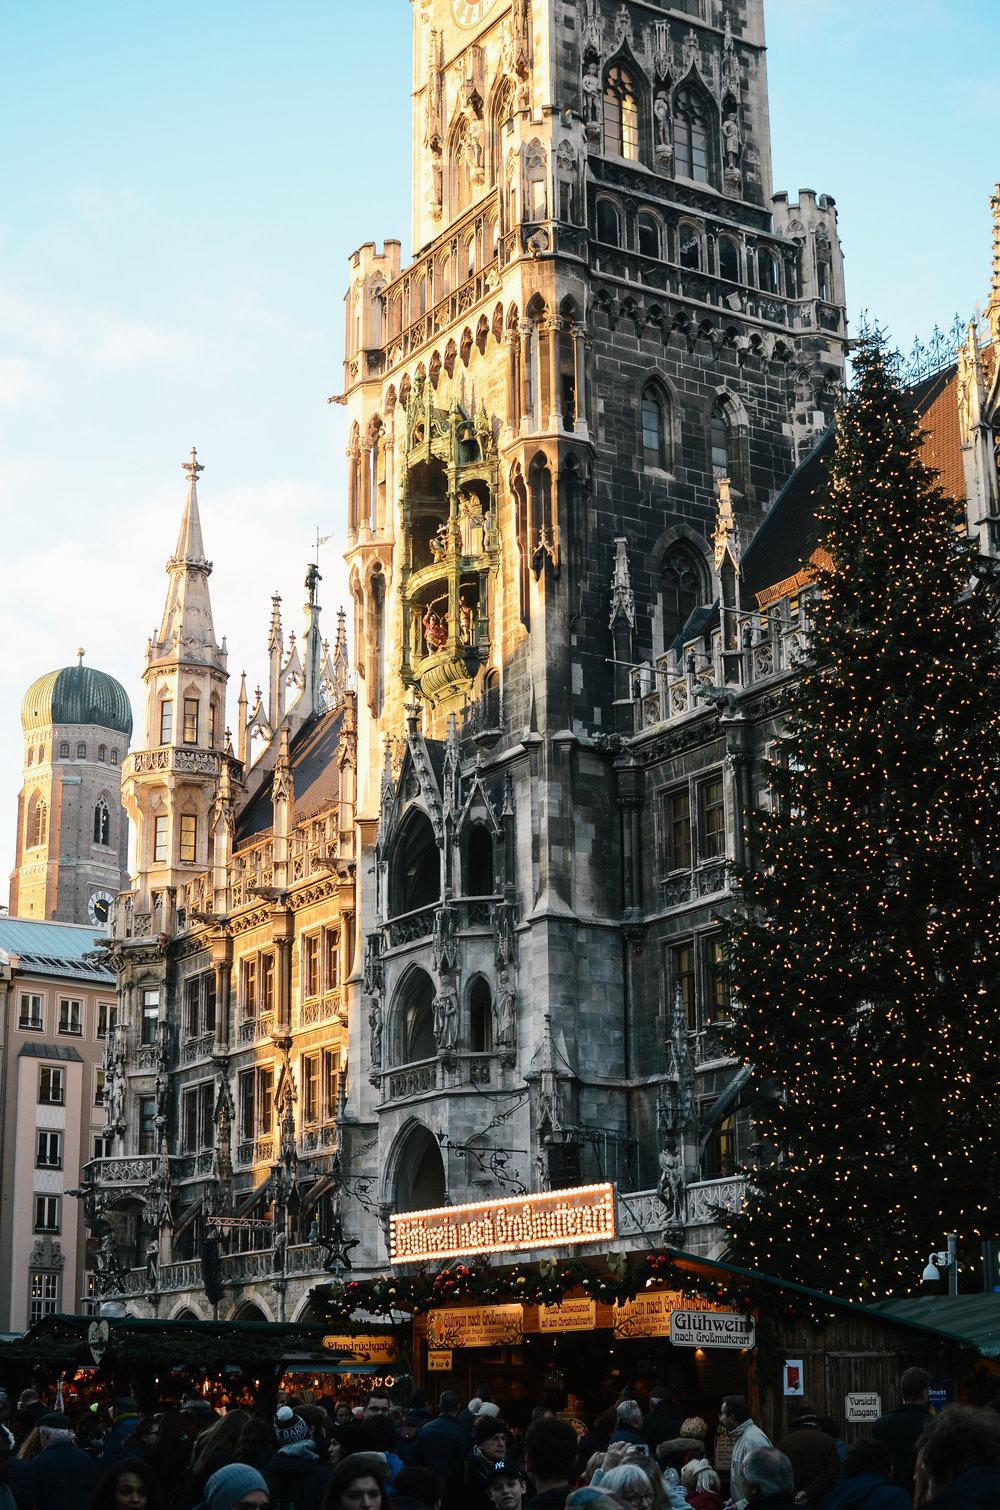 european-christmas-market-travel-guide-lifeonpine_DSC_1991.jpg